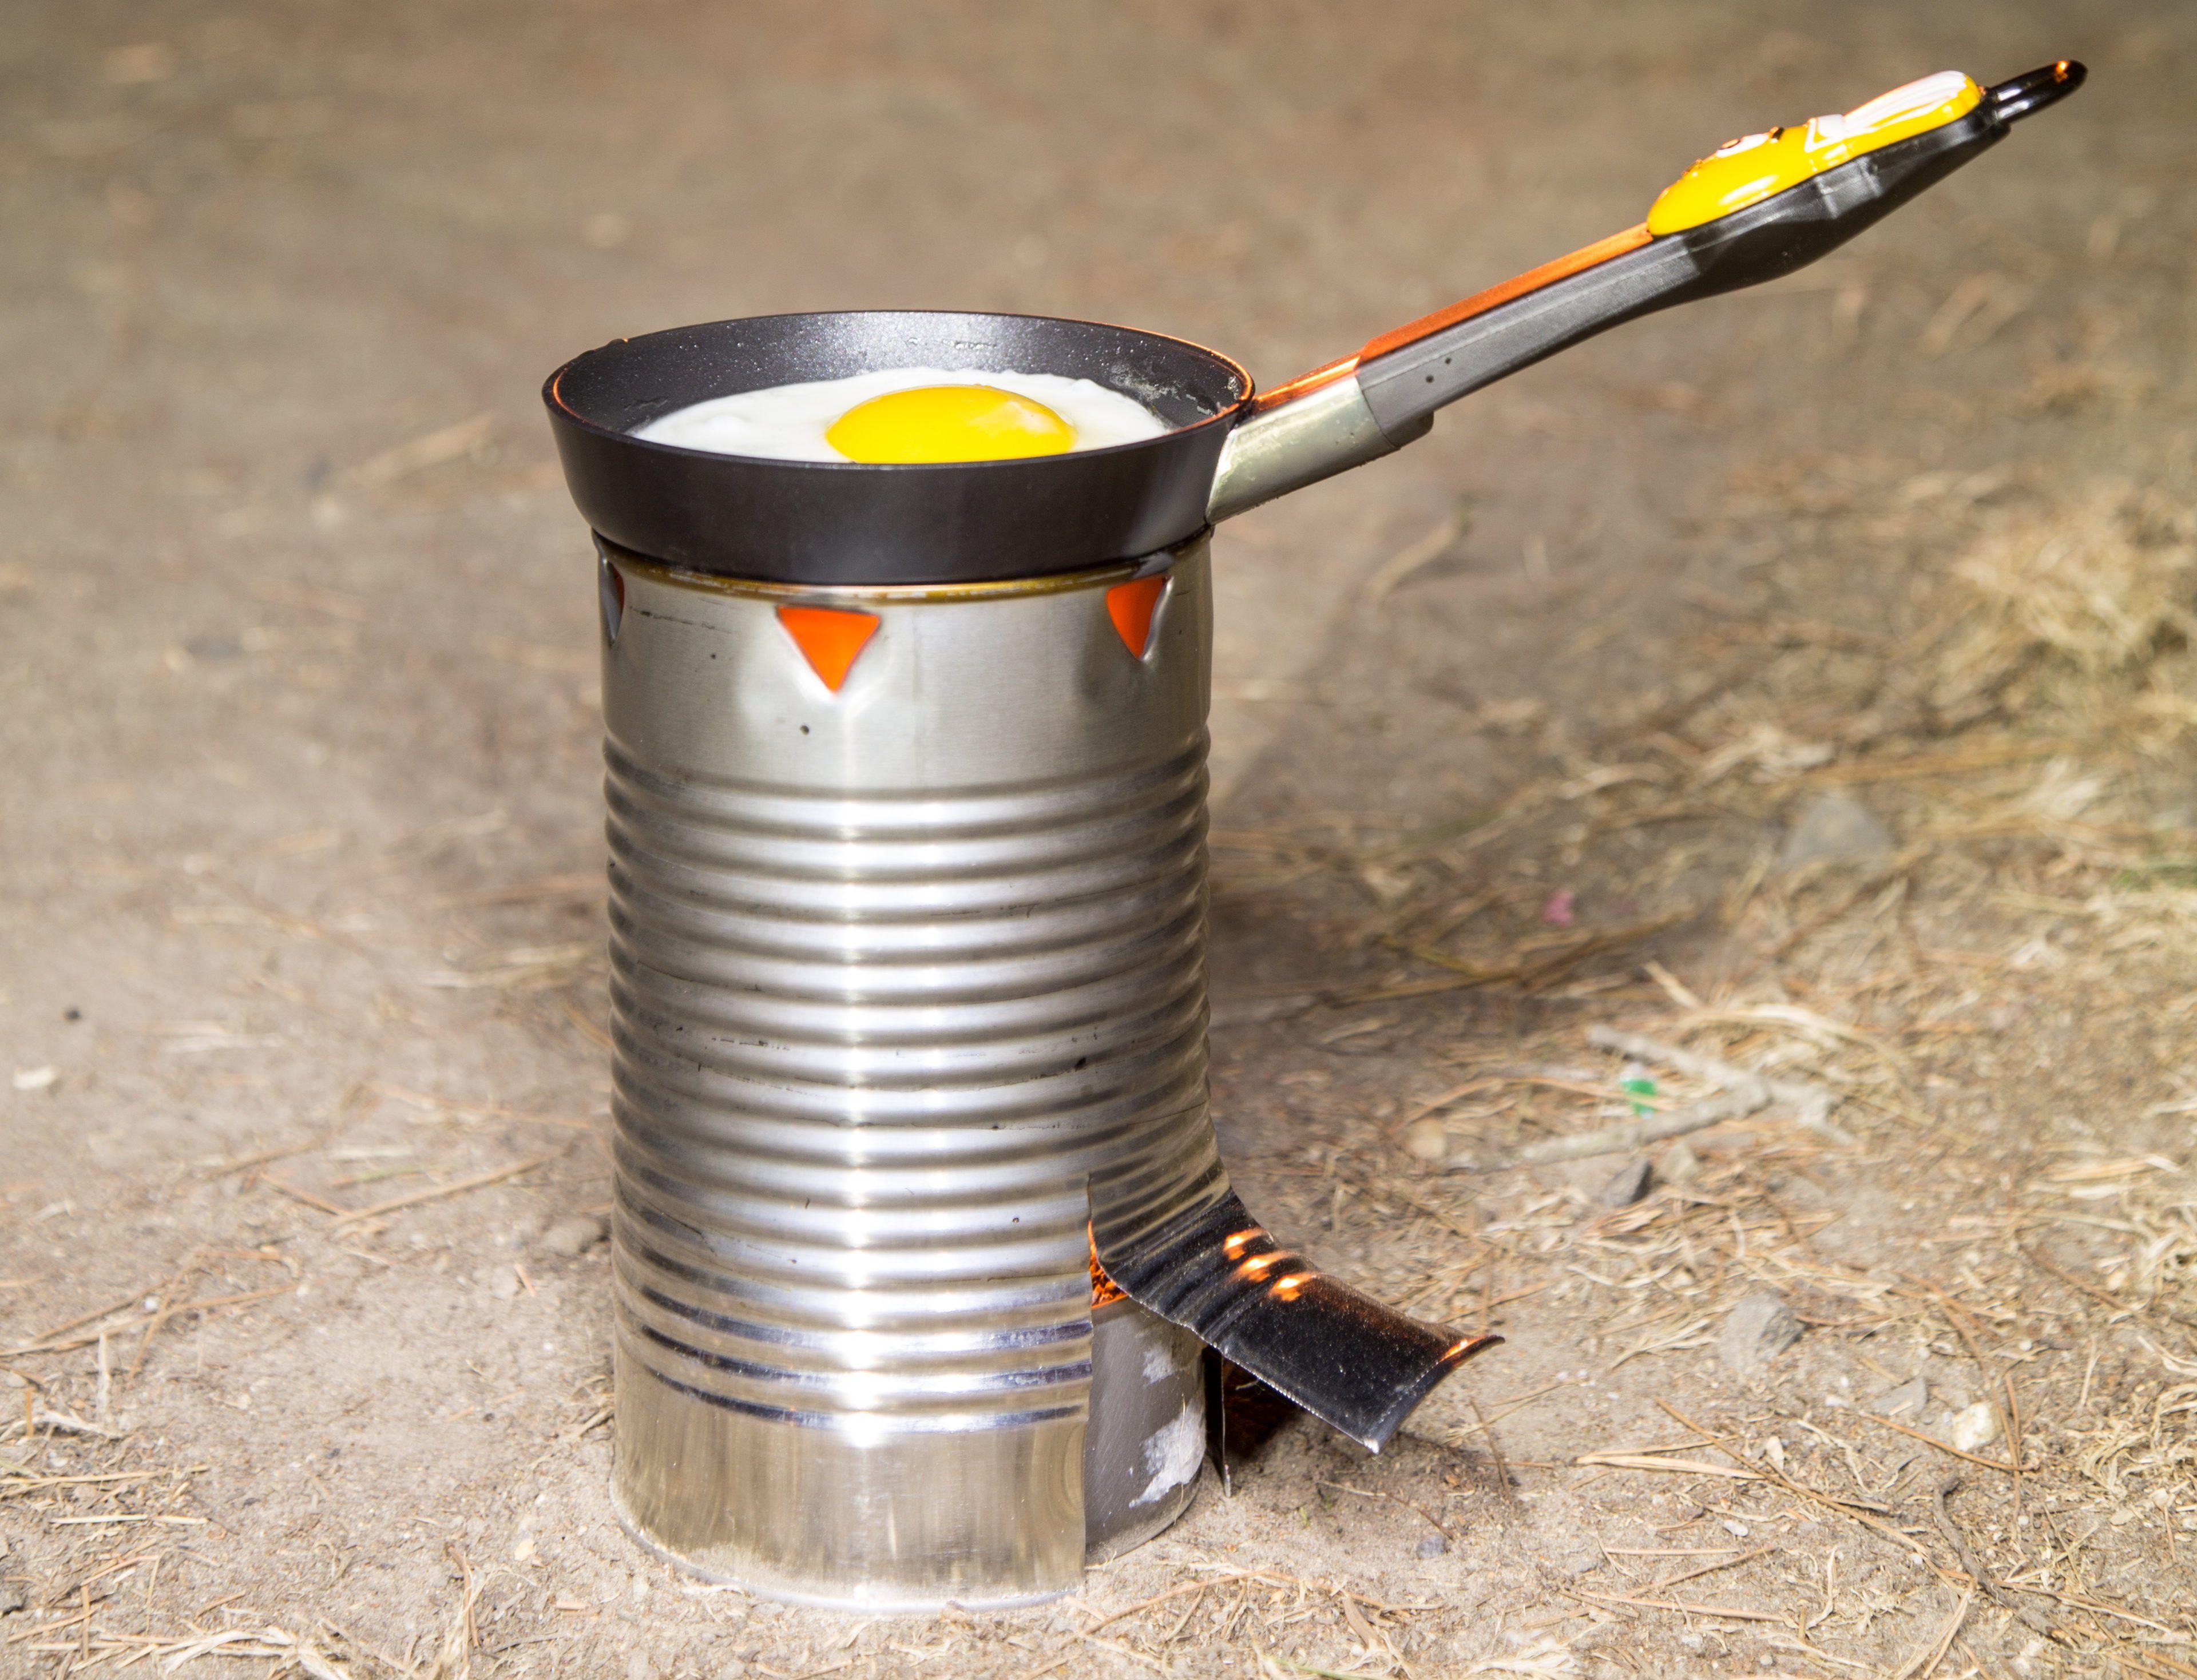 Small Pocket Buddy Burner Cooking Survivalist,camping,Prepper Survival,stove